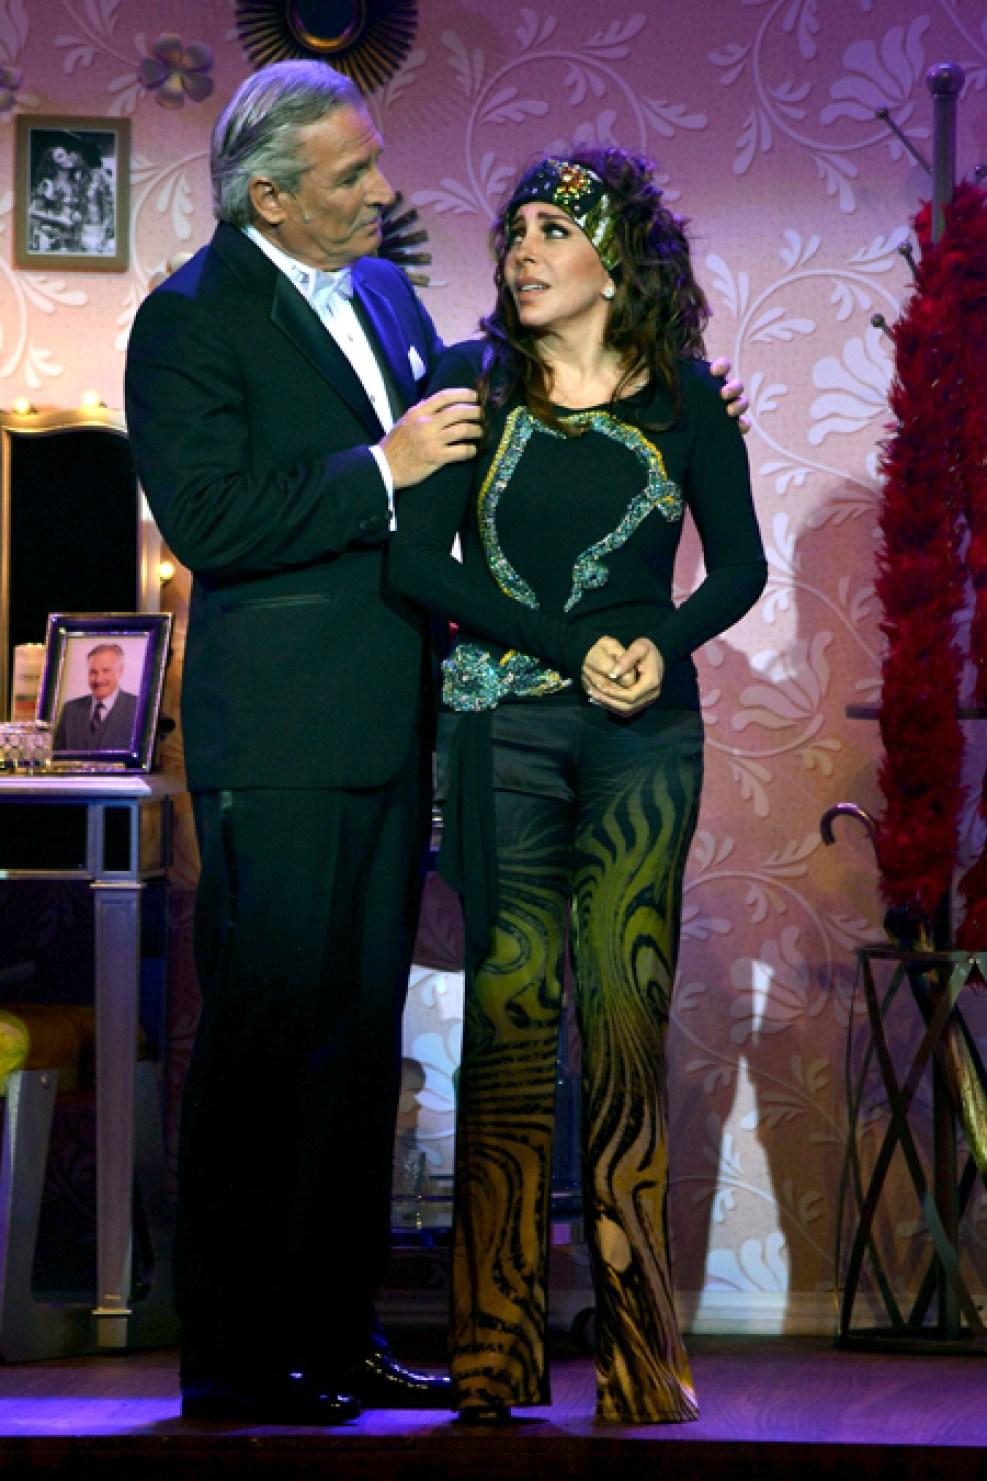 http://media.telemundo51.com/images/987*1481/veronica-castro-teatro-aplauso-04.jpg